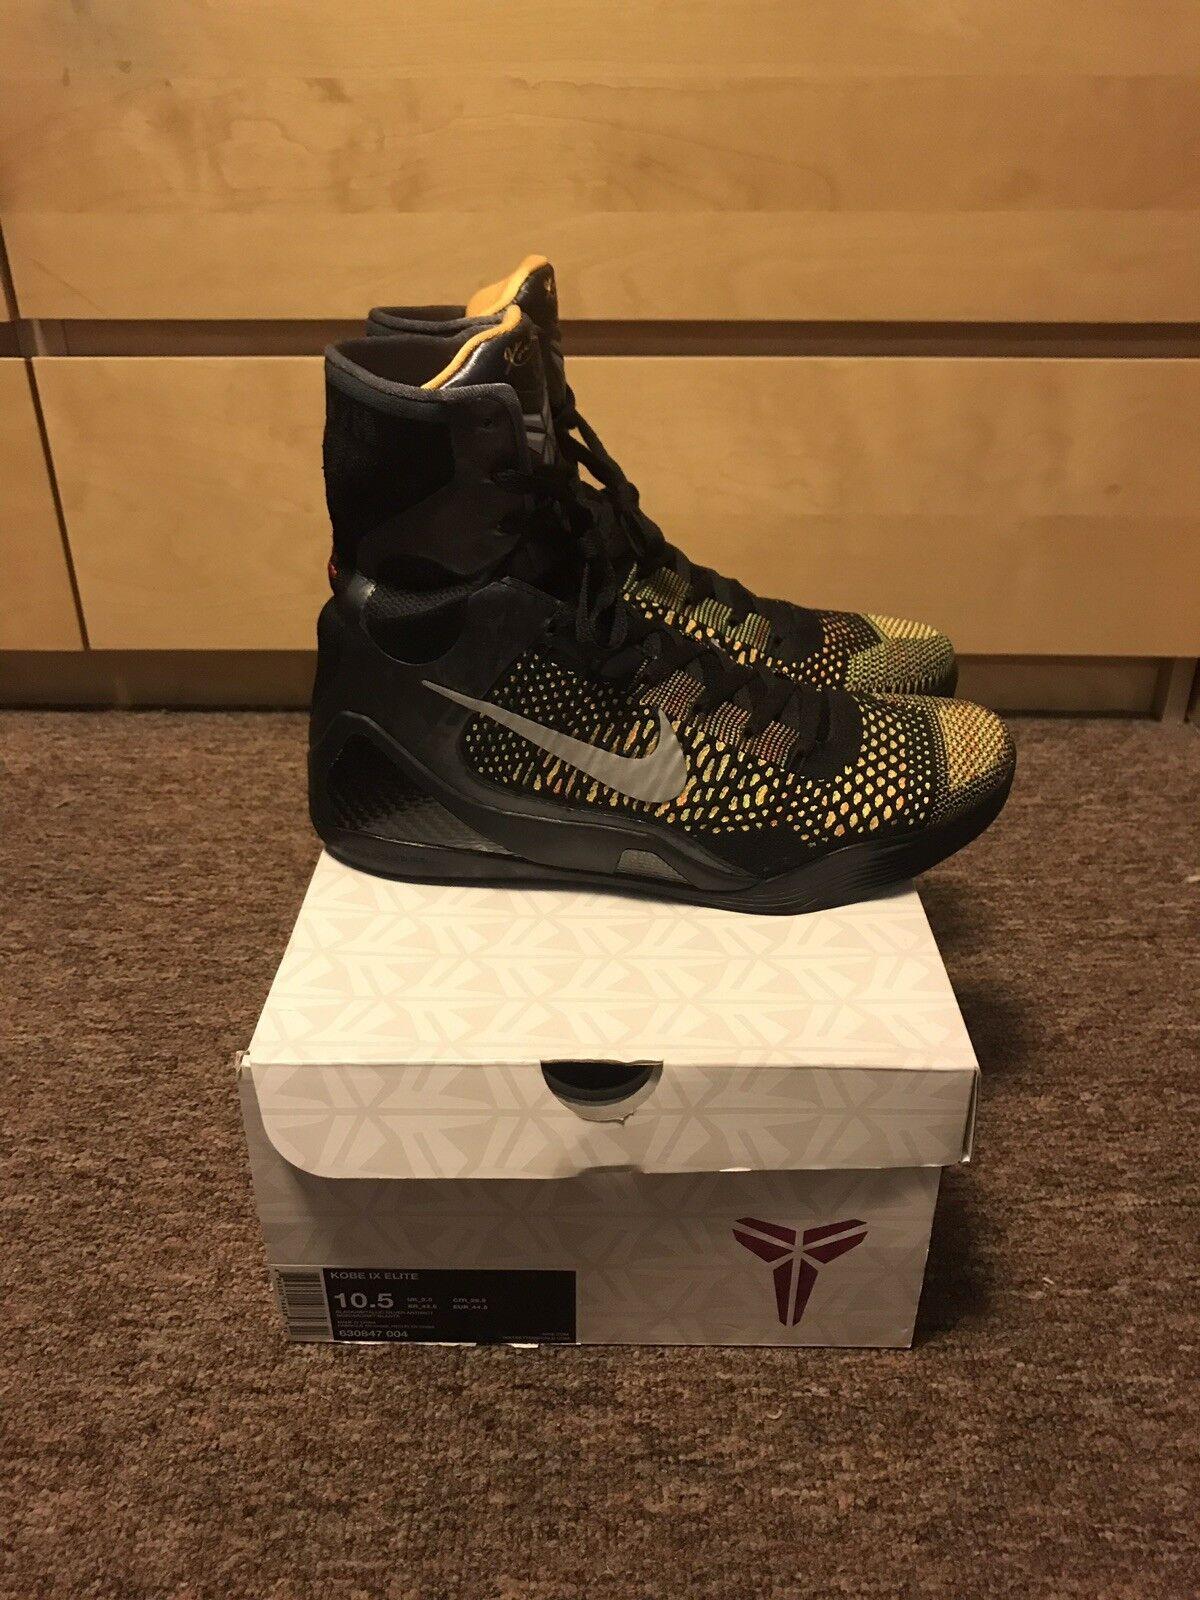 buy online e6f92 f3d4b Nike Kobe IX Elite Inspiration Size Size Size 10.5 88acd9